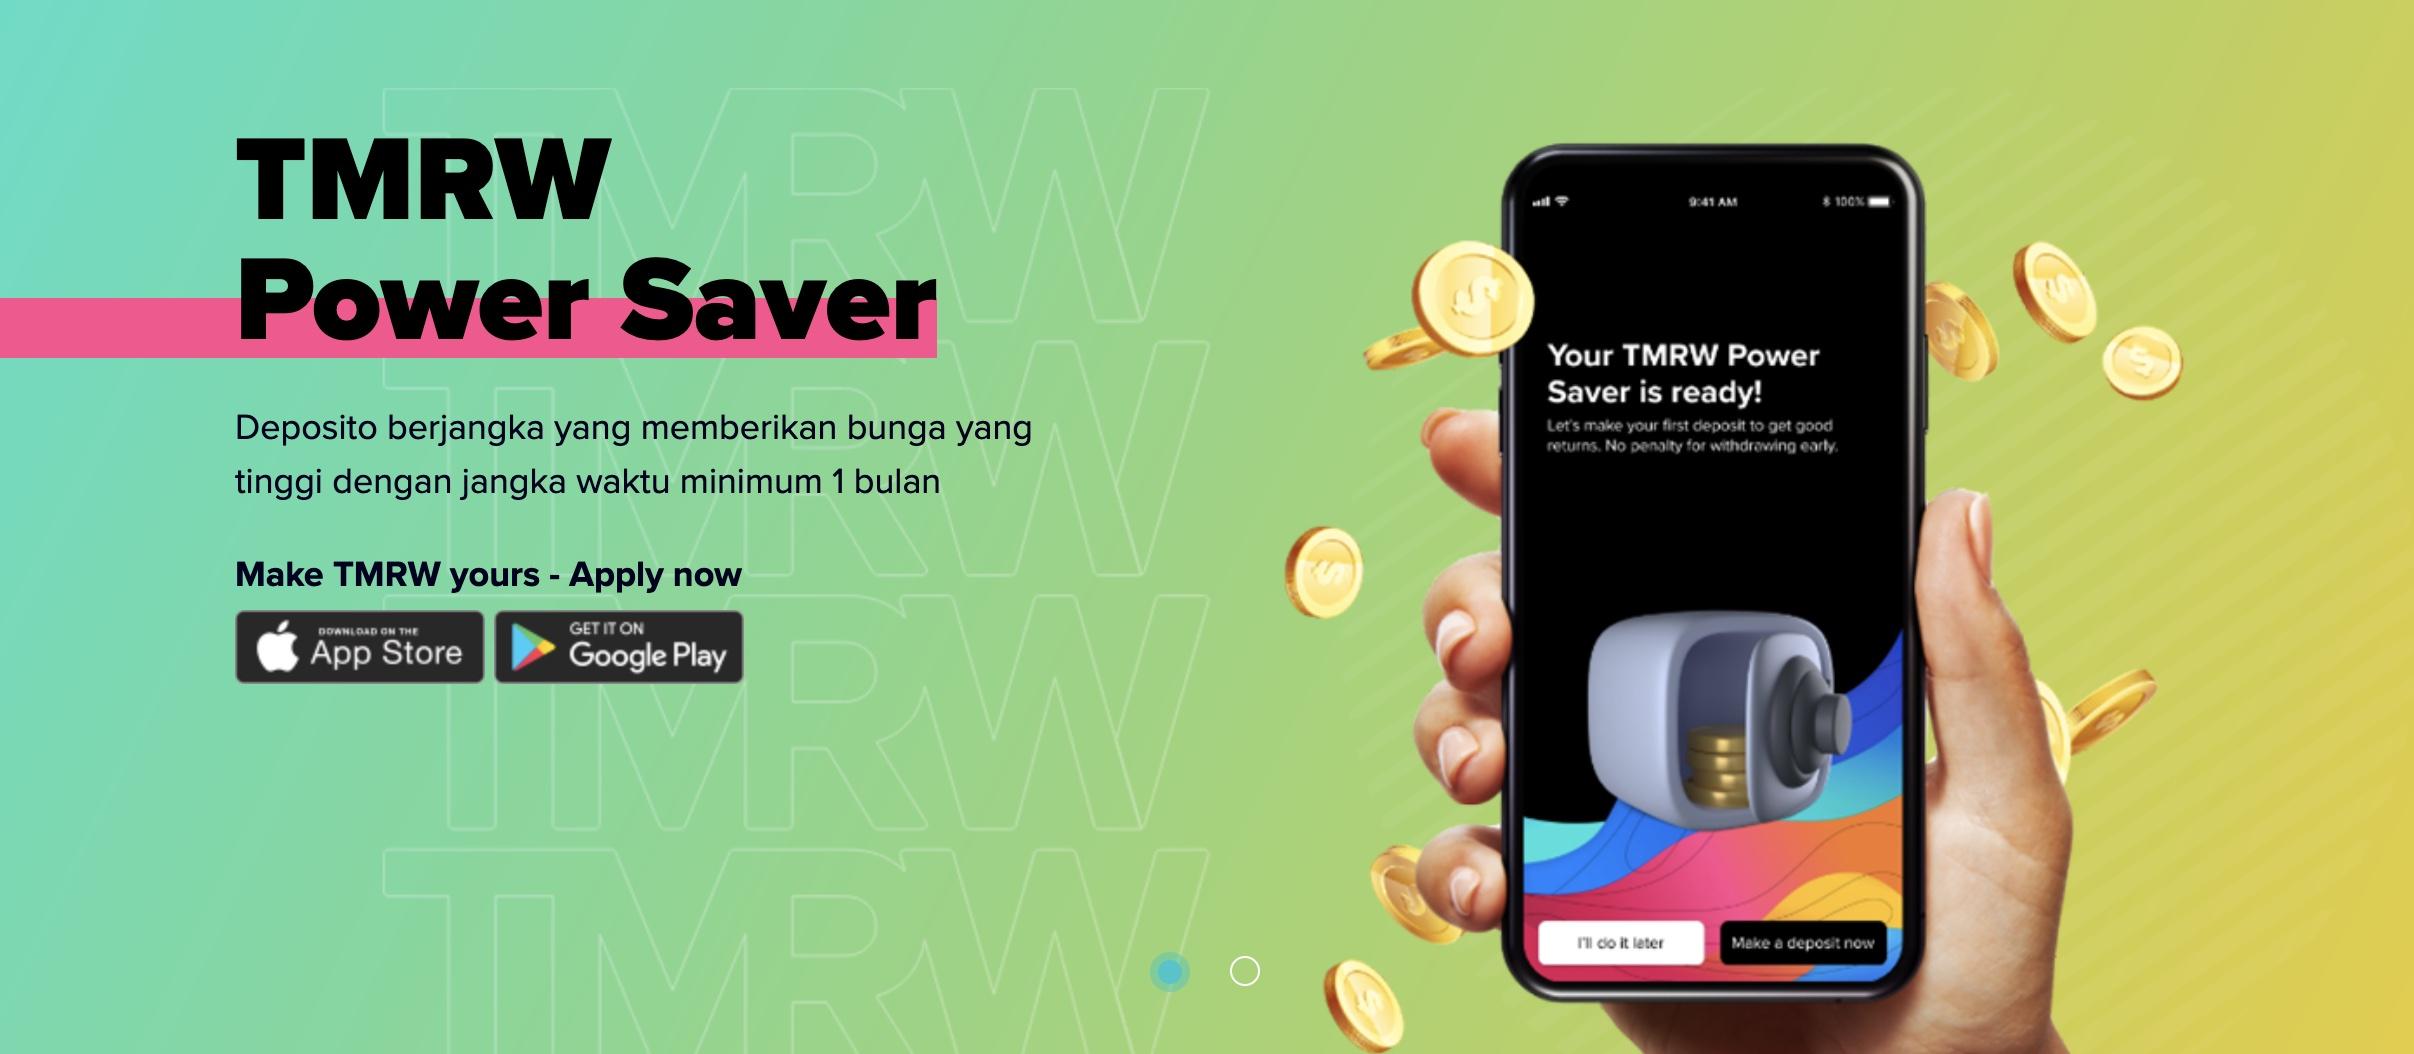 TMRW by UOB: Power Saver dan City of TMRW